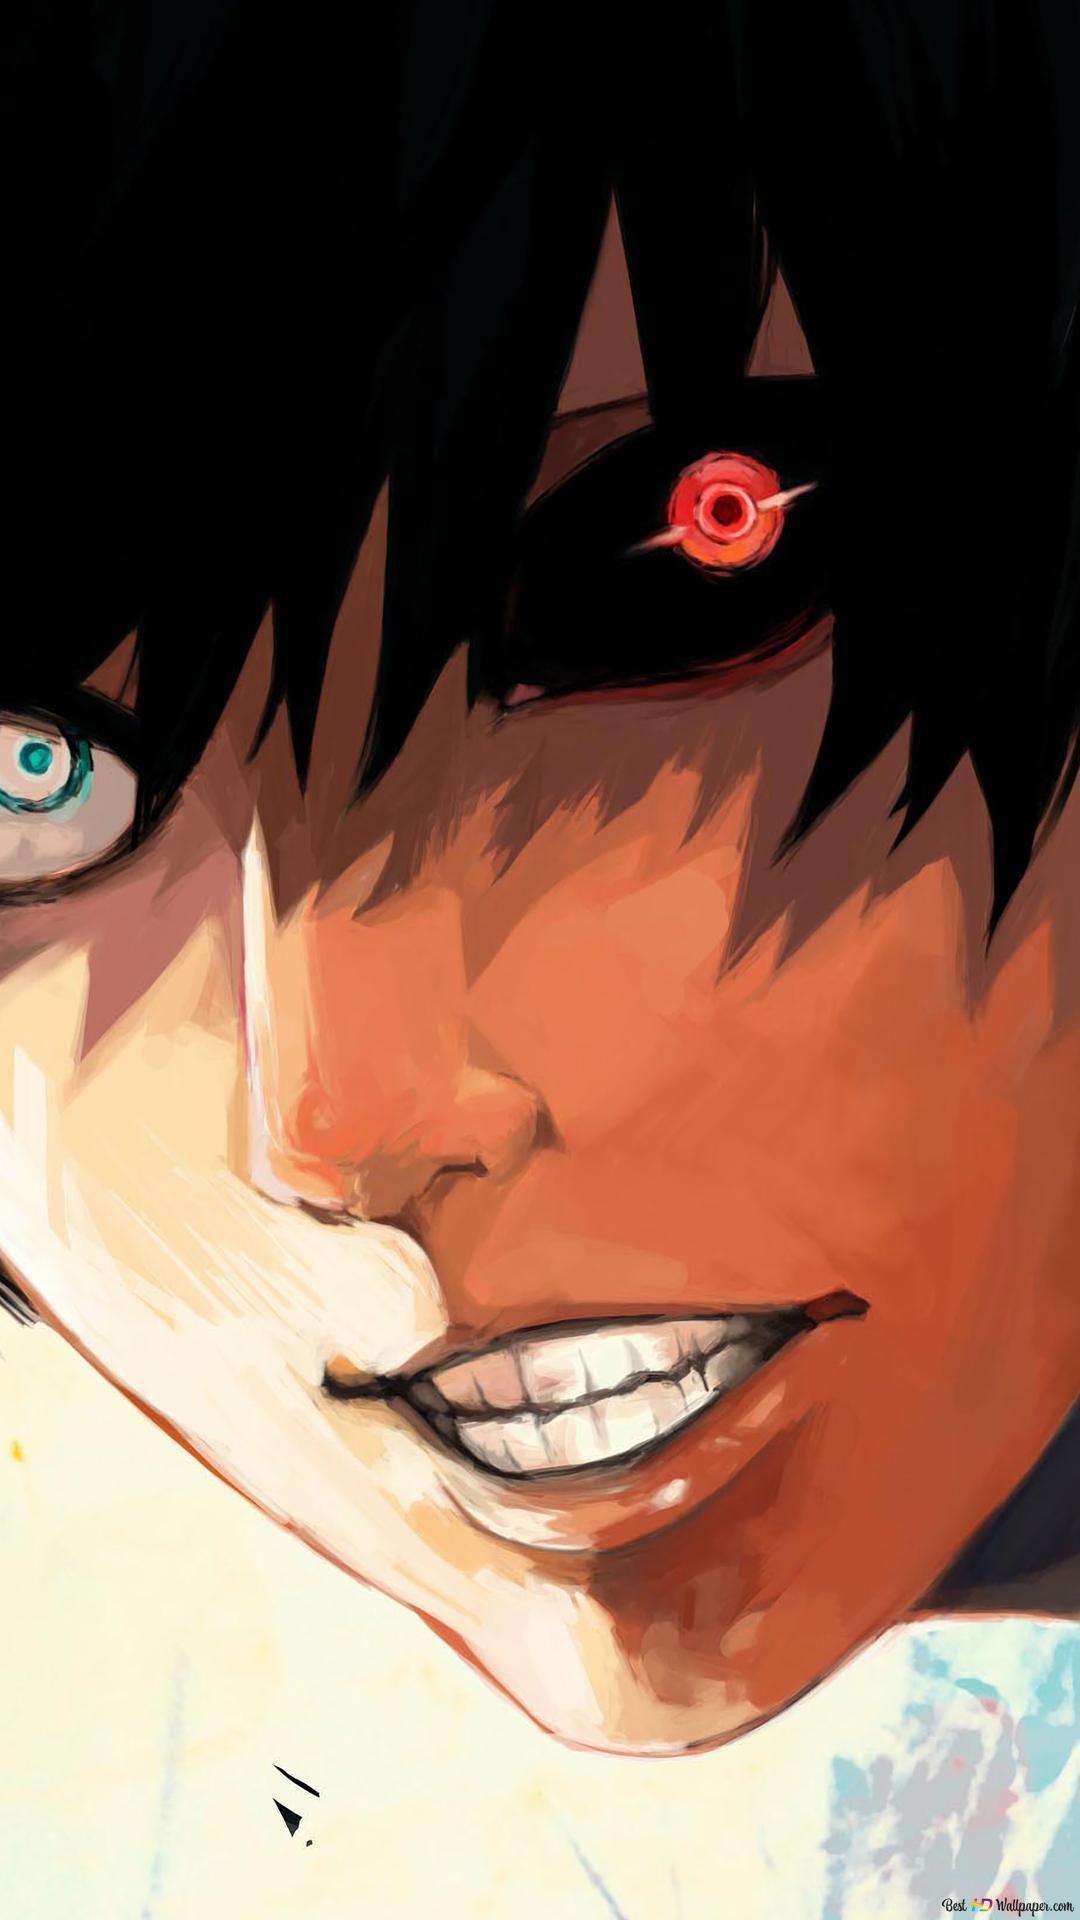 Tokyo Ghoul Re Ken Kanekimemories Returned Hd Wallpaper Download